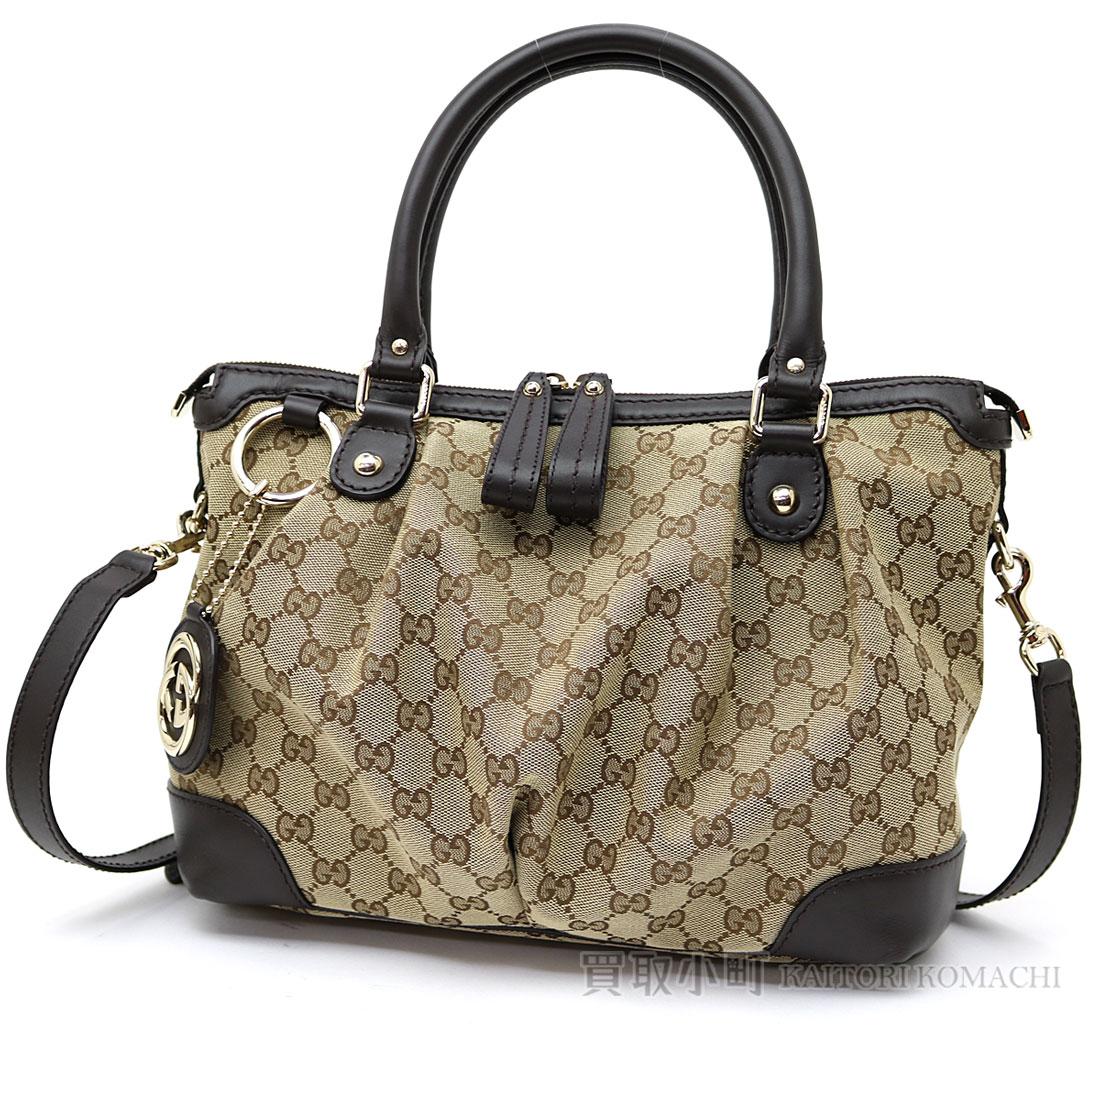 Take Gucci Sioux Key Original Gg Canvas Top Steering Wheel Bag Interlocking Grip G Charm Beige X Dark Brown Medium 2way Shoulder Slant Handbag Double